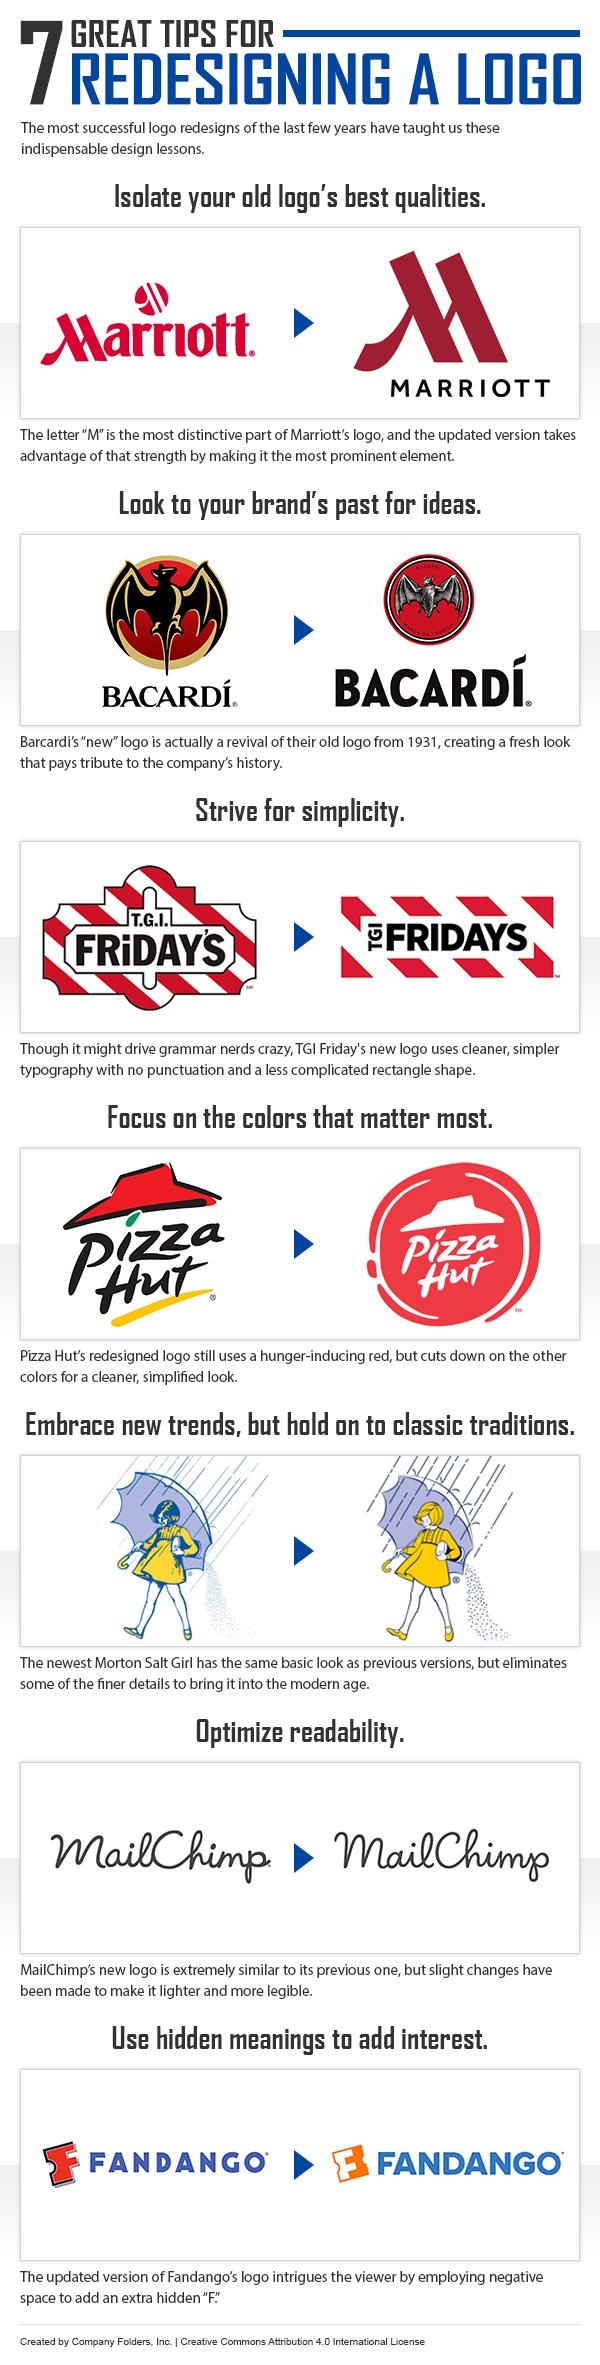 logo-redesign-tips